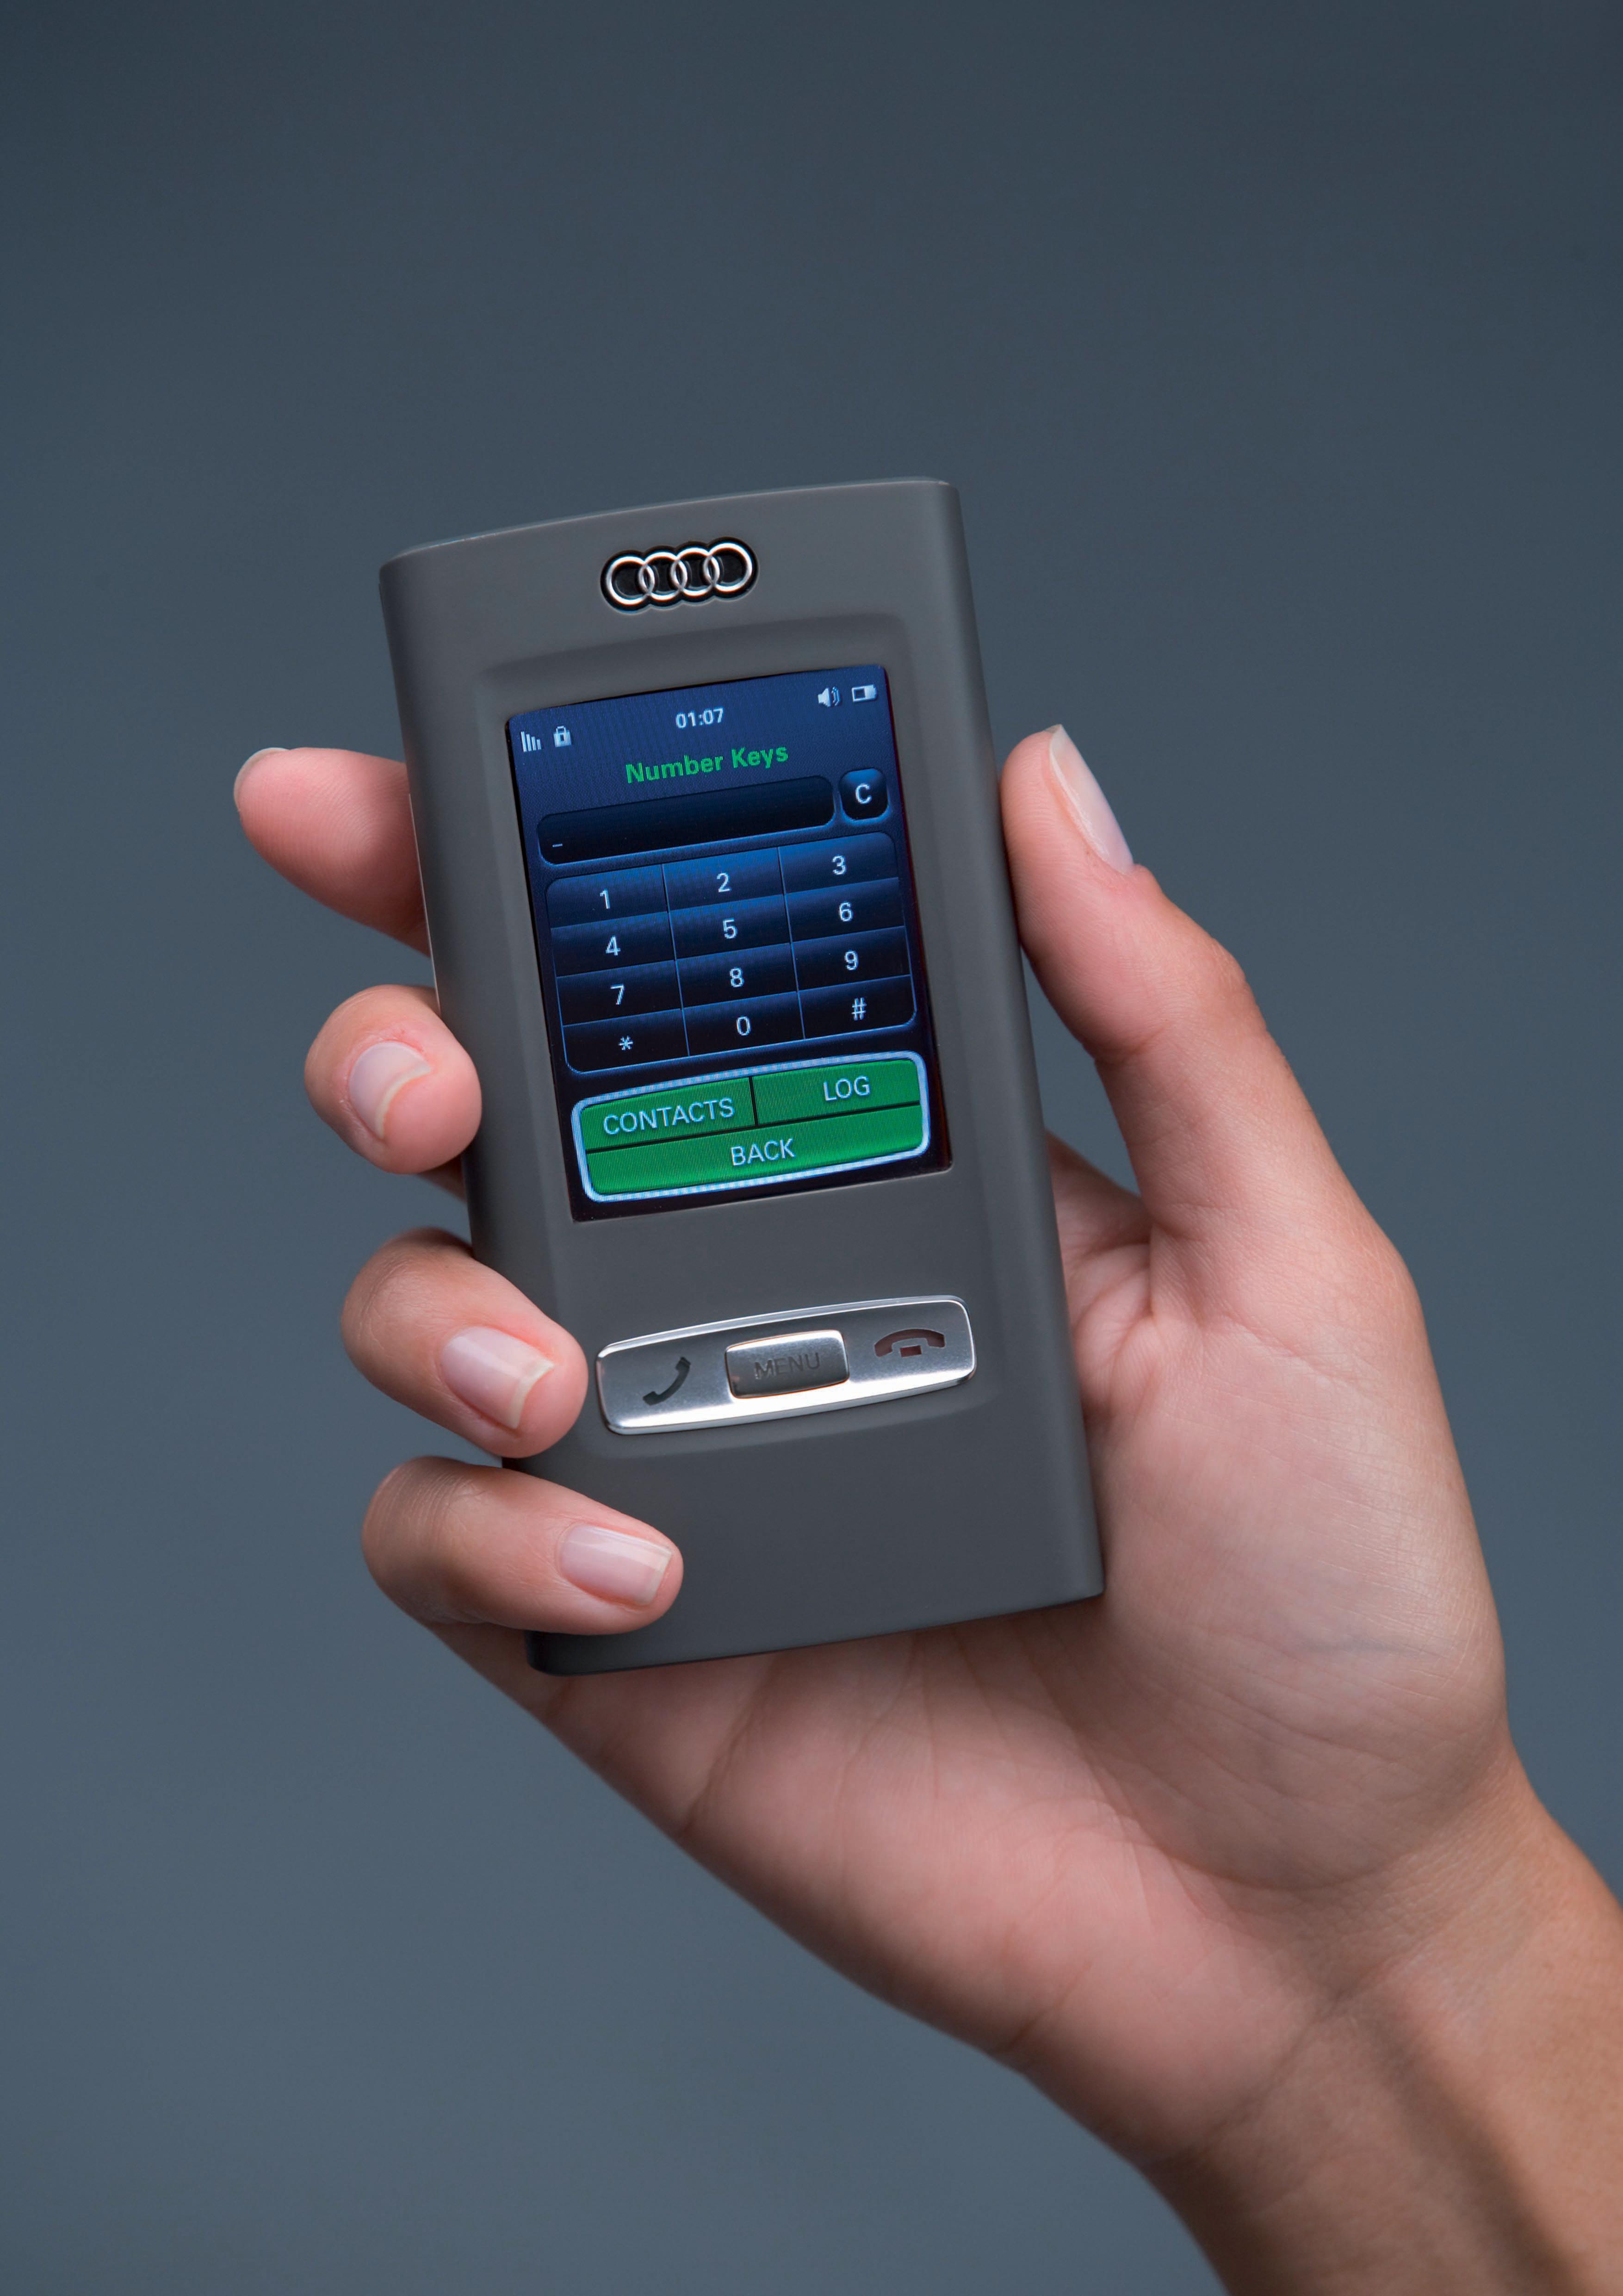 Audi metroproject quattro/Audi mobile device